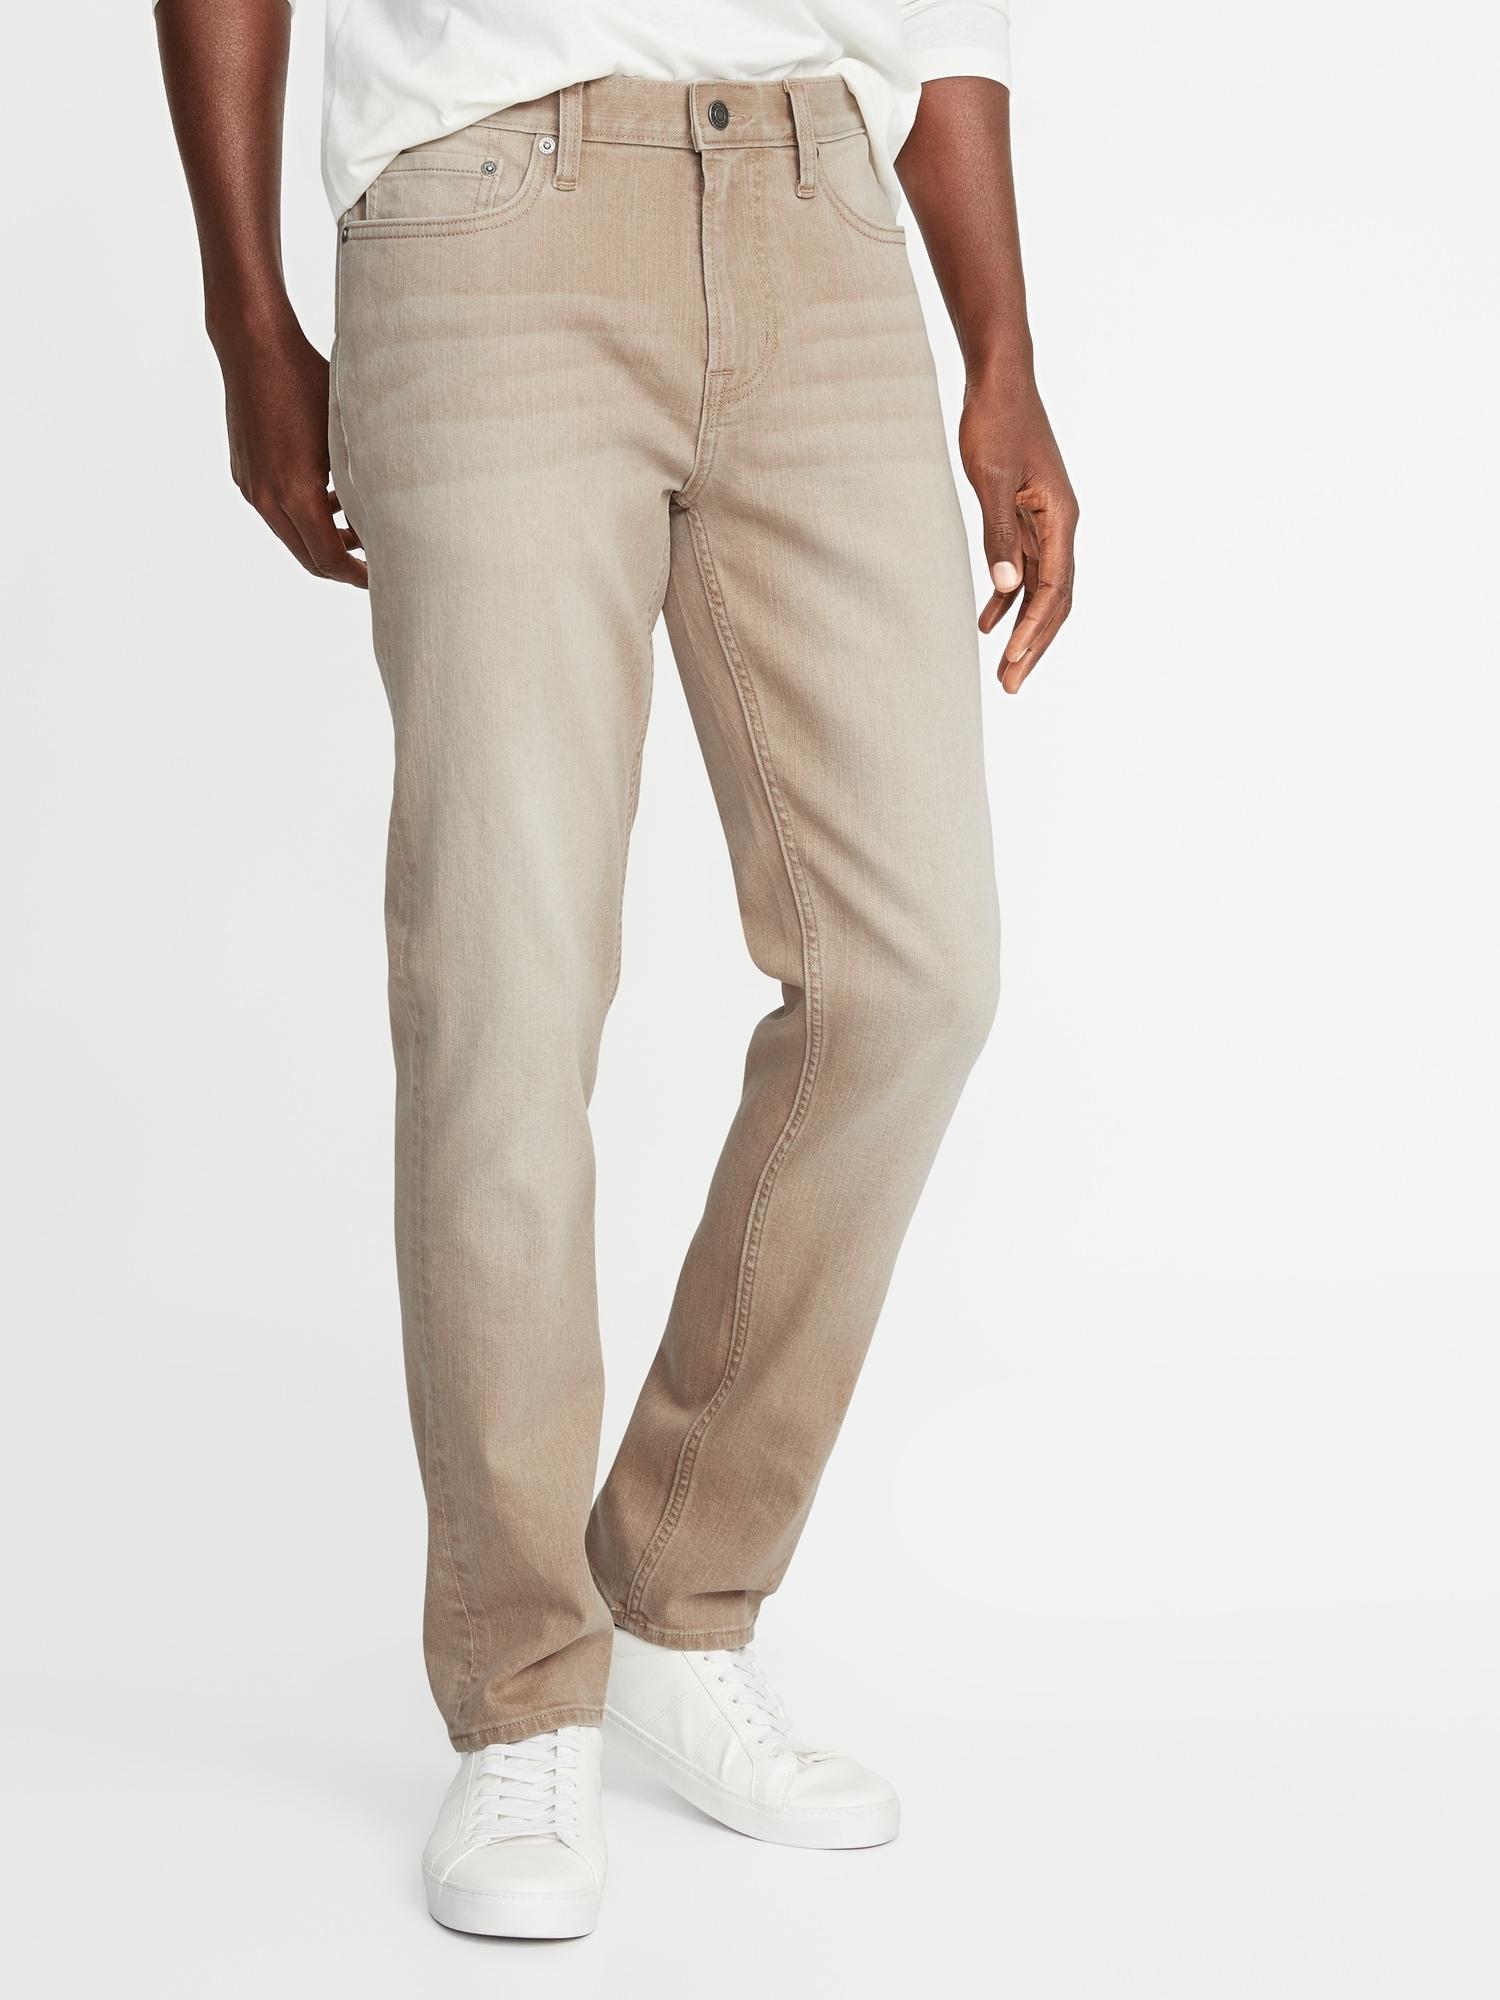 5e2fb804 Slim Built-In Flex Khaki-Wash Jeans for Men | Old Navy